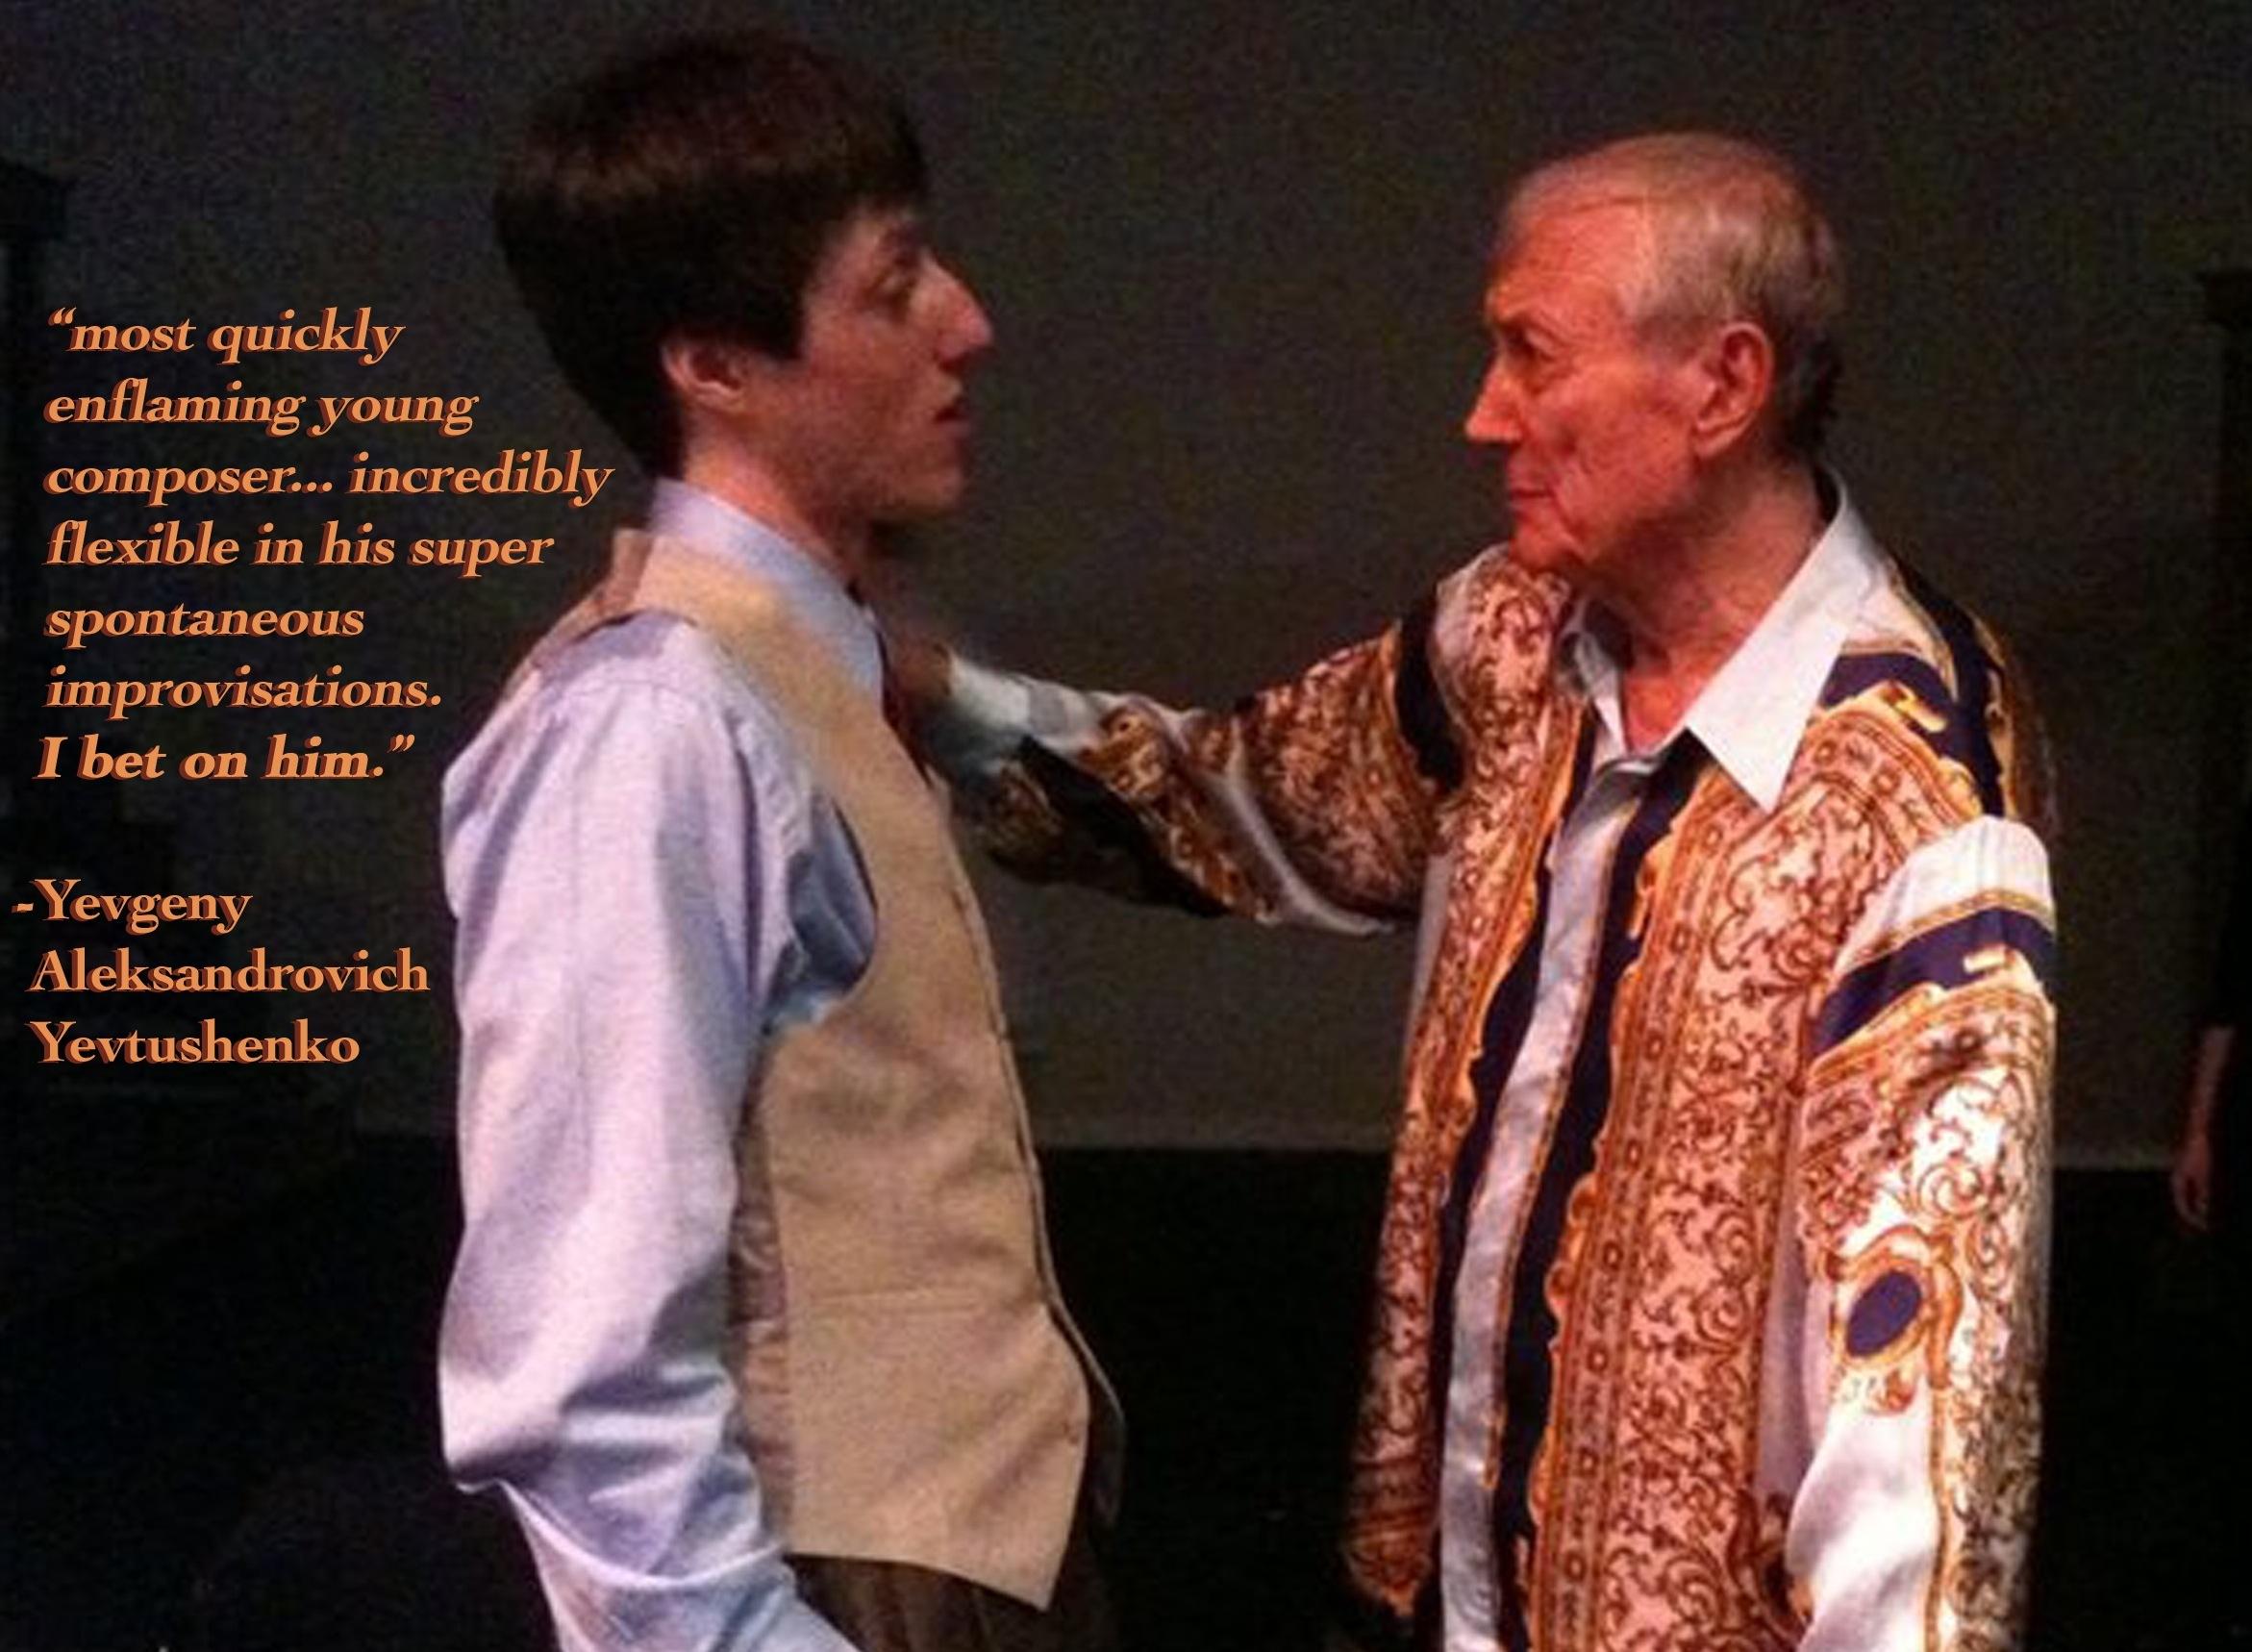 After my 2010 (3-hour!) performance with Yevgeny Yevtushenko in Tulsa, OK